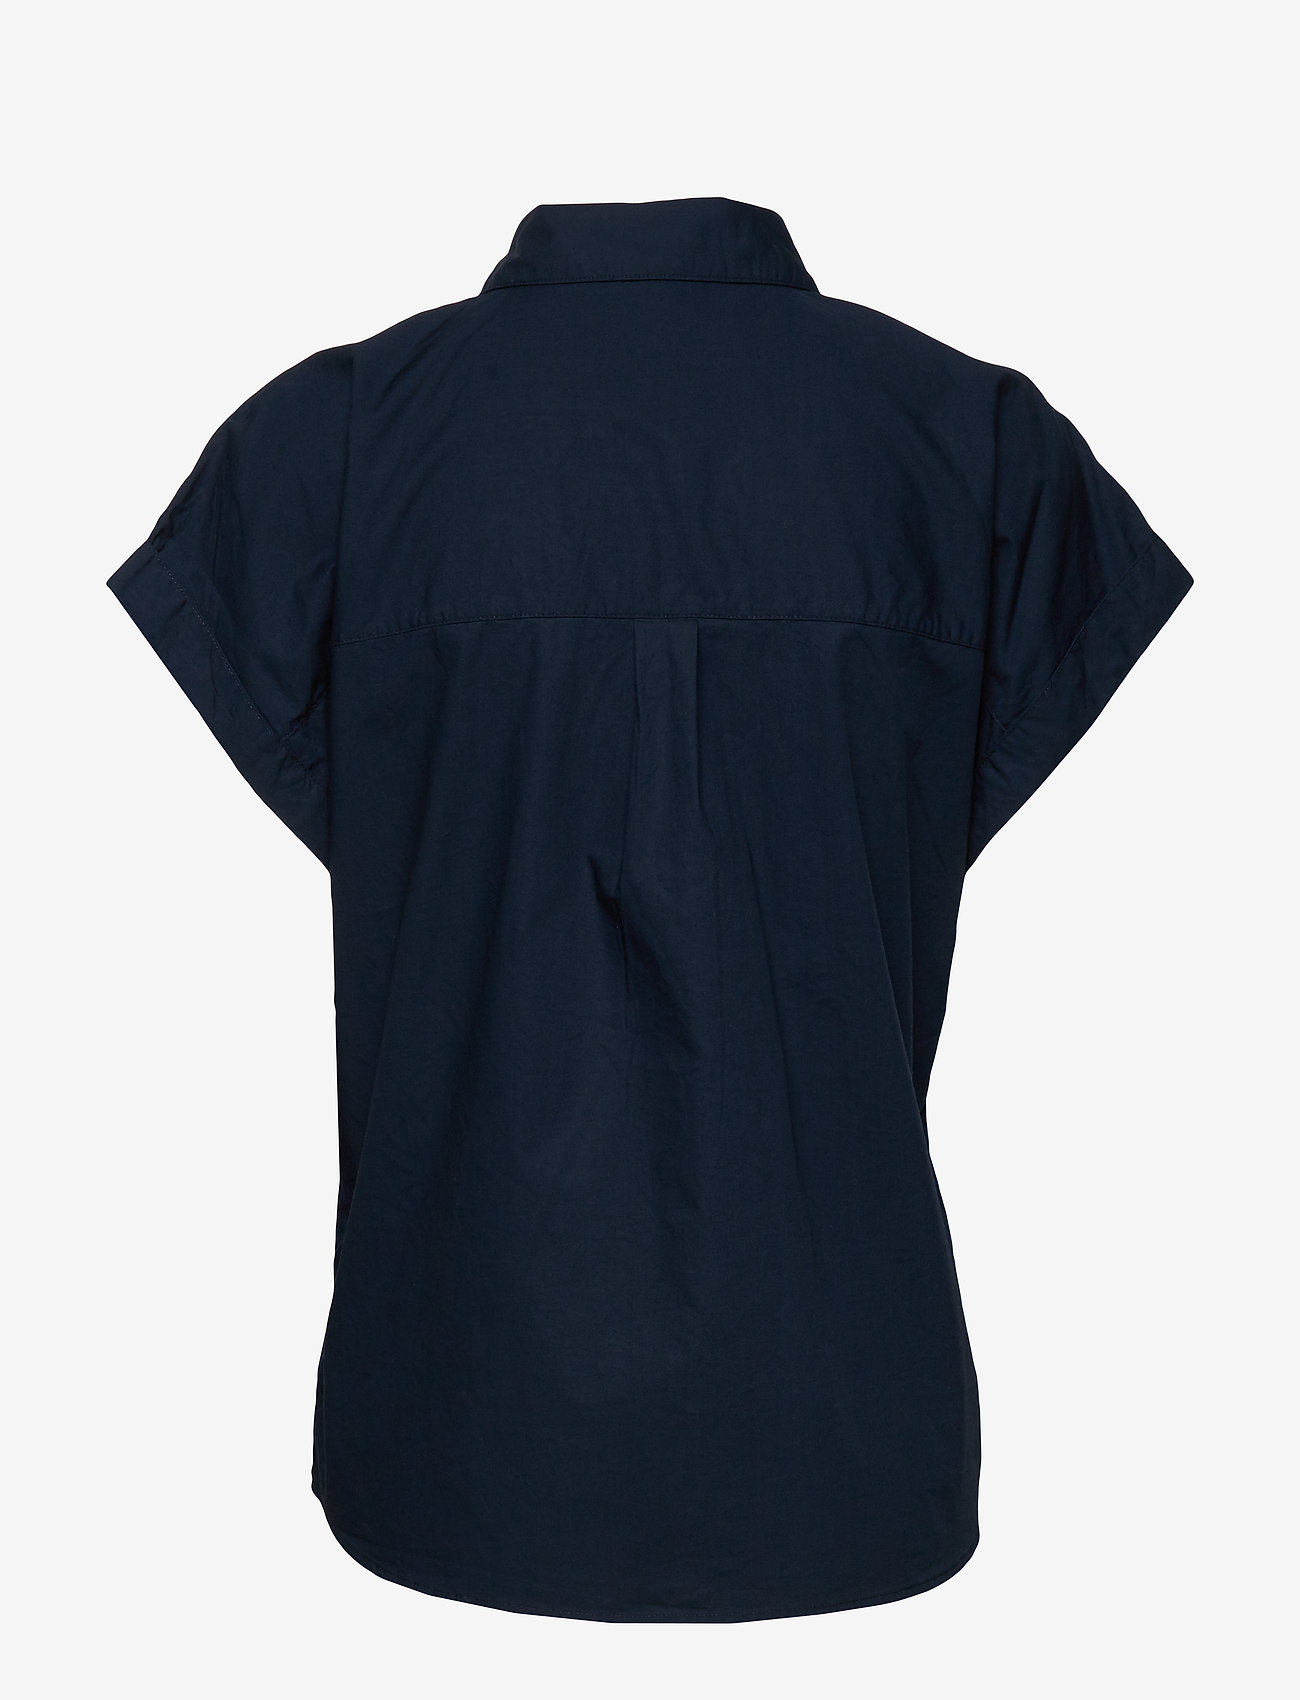 Esprit Casual - Blouses woven - kortermede skjorter - navy - 1